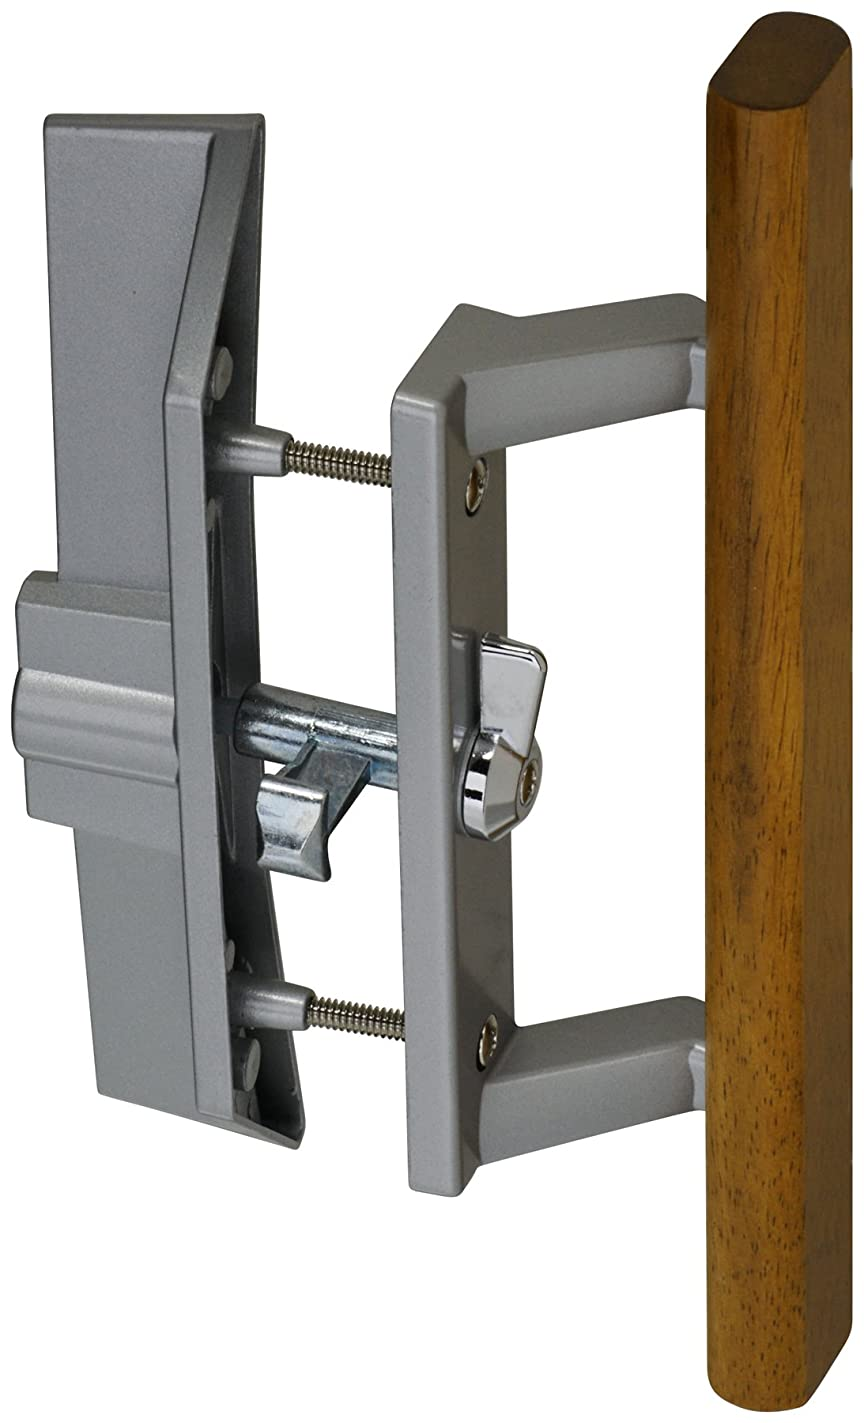 Stanley National N349-209 Locking Patio Door Handle Latch Set